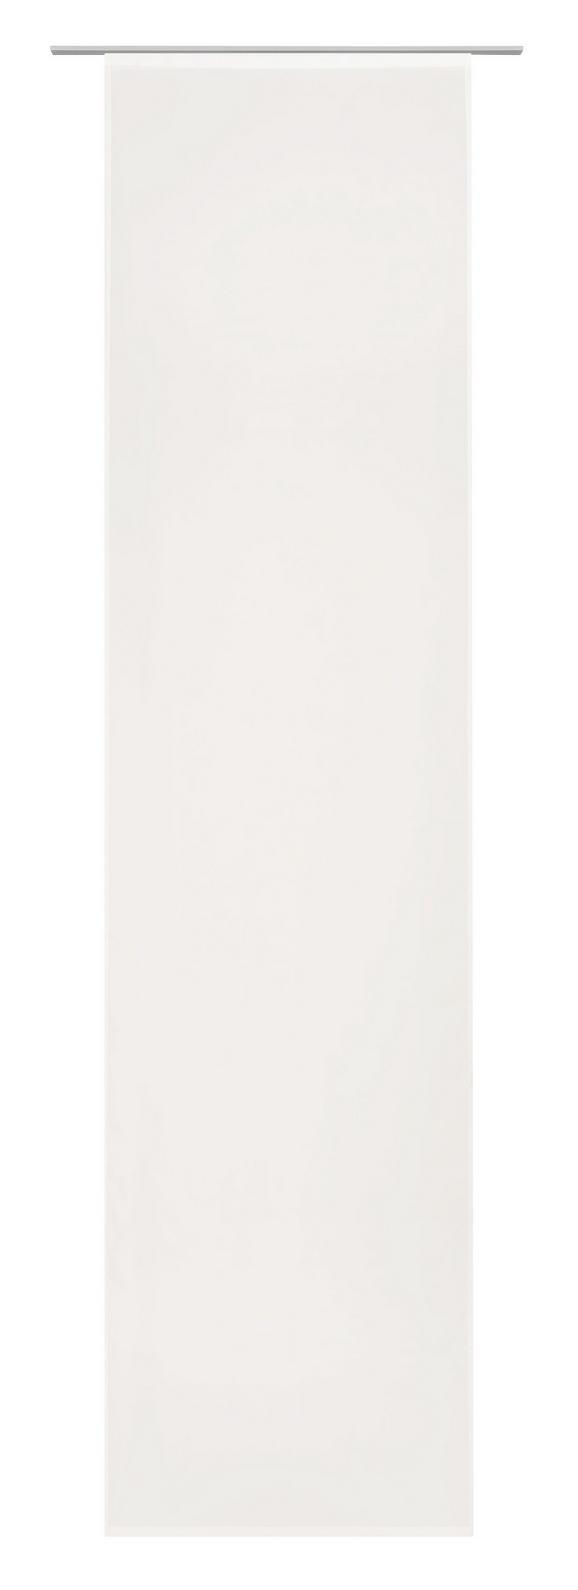 Flächenvorhang Flipp Creme 60x245cm - Creme, Textil (60/245cm) - Based